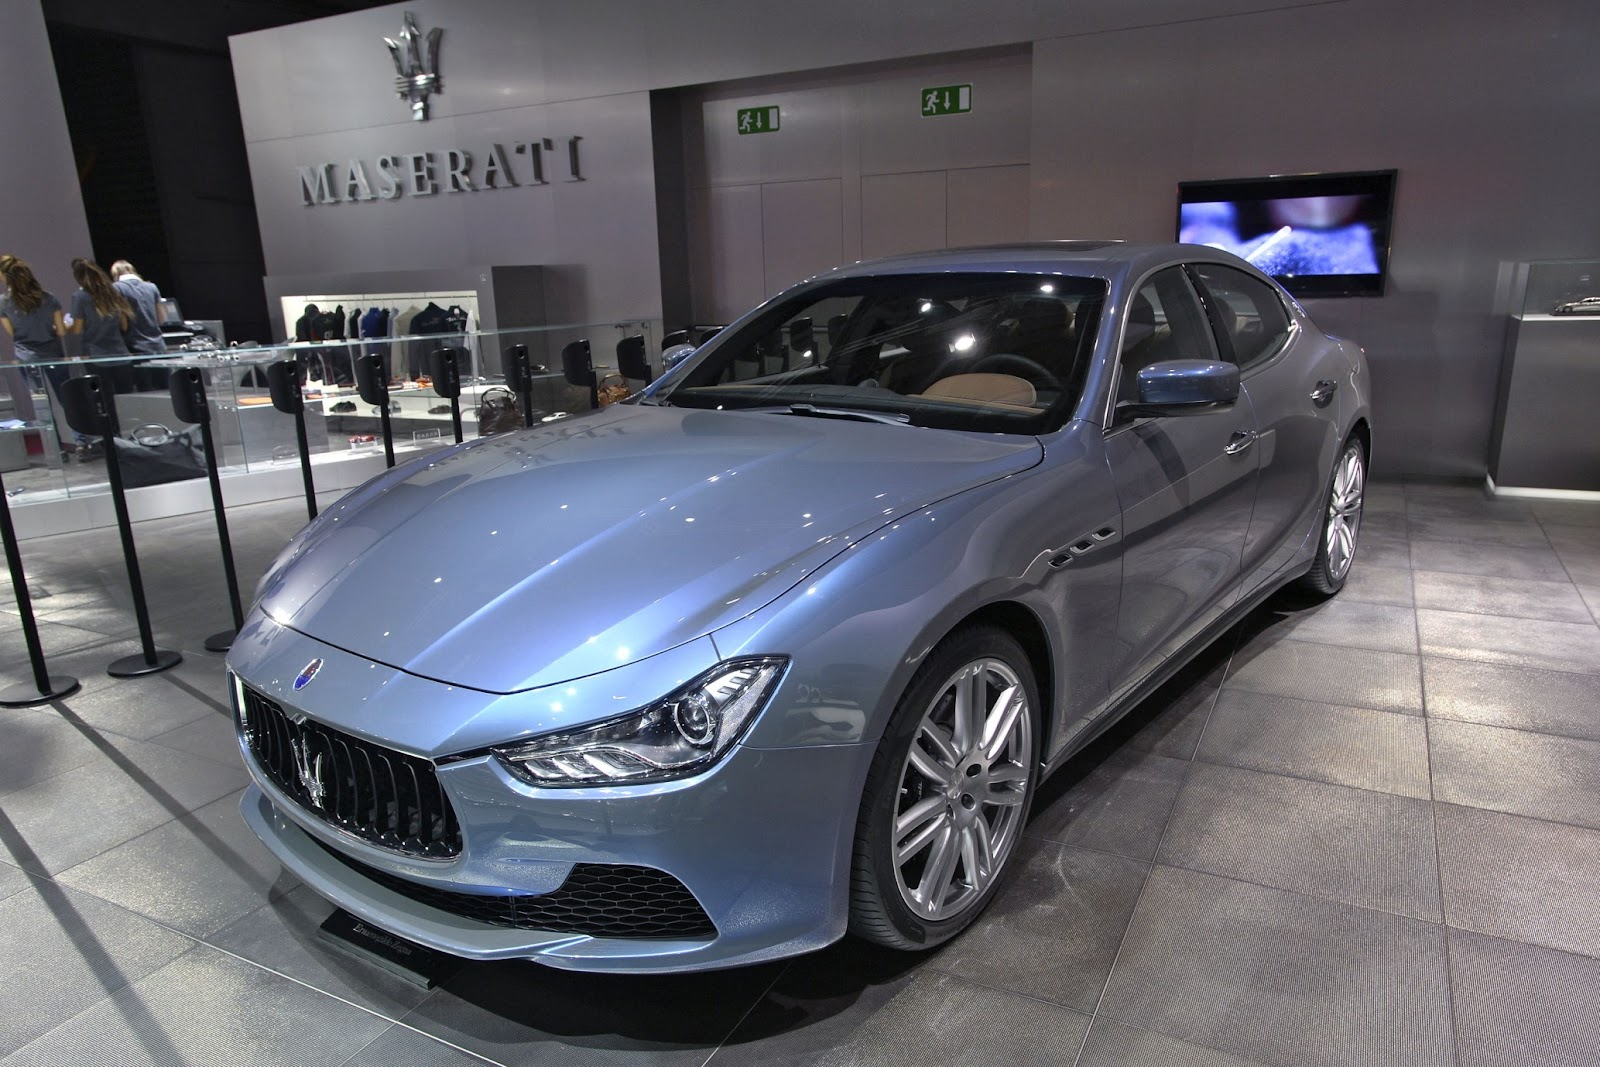 http://lh4.ggpht.com/-xYhDwXi8kKk/VDCX067QVrI/AAAAAAABrTA/wRwC4lgpyrI/s1600/Maserati-Ghibli-Ermenegildo-Zegna-Edition-13.jpg